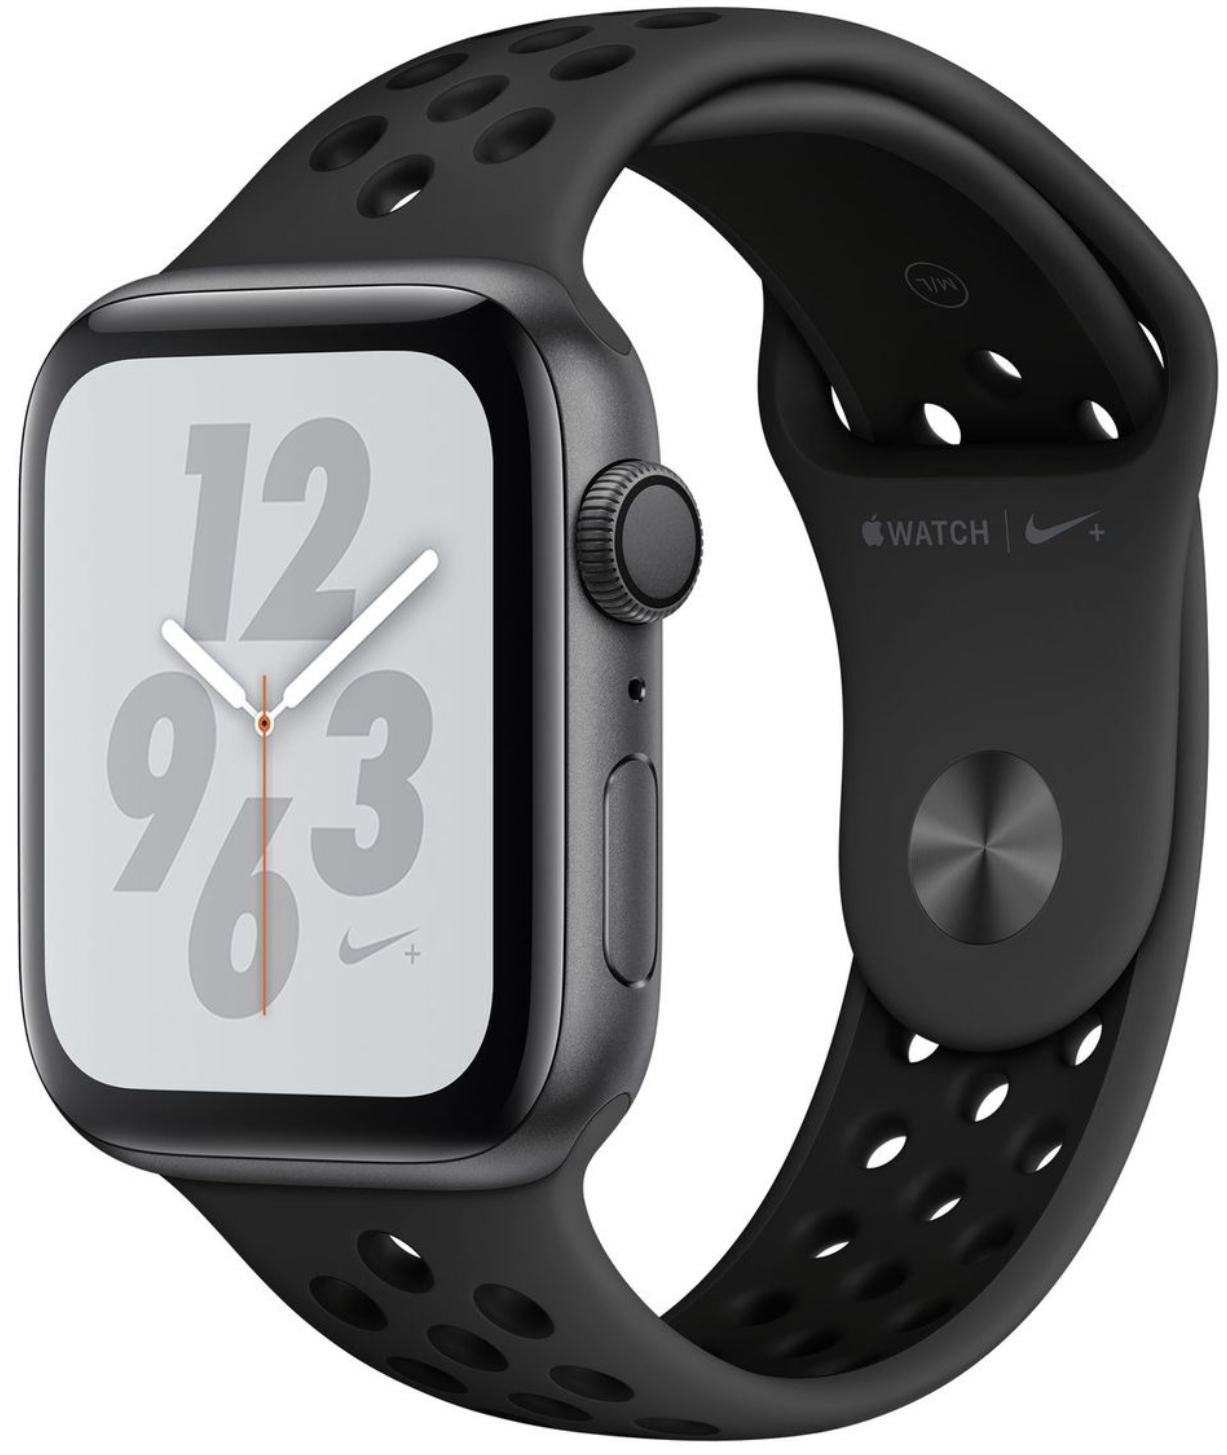 Apple Watch Series 4 Nike+ GPS 44 mm Alu Sportarmband für 404€ inkl. Versandkosten [Gravis ebay]